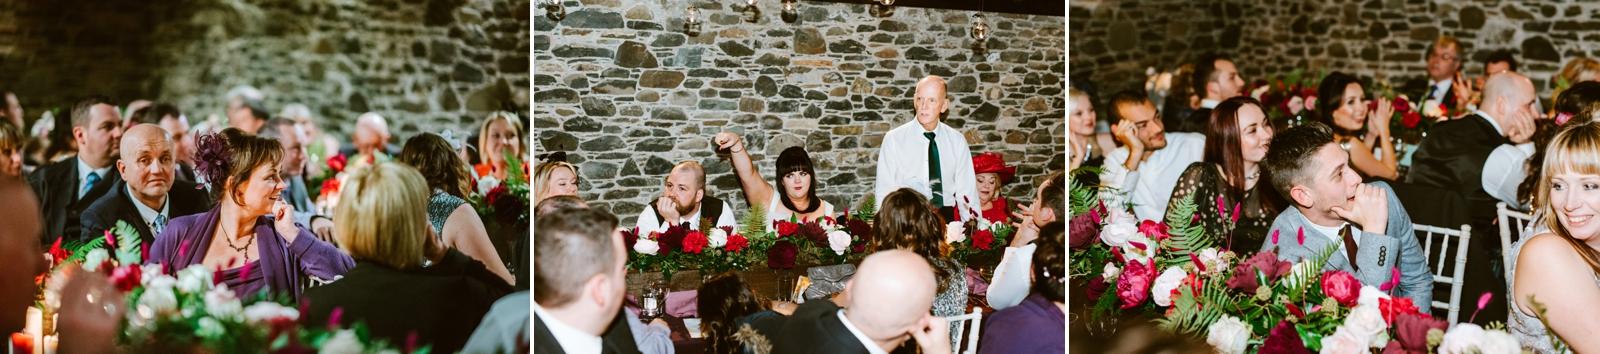 alternative-wedding-photography-scotland-katie-stephen-aikwood-tower-410.jpg